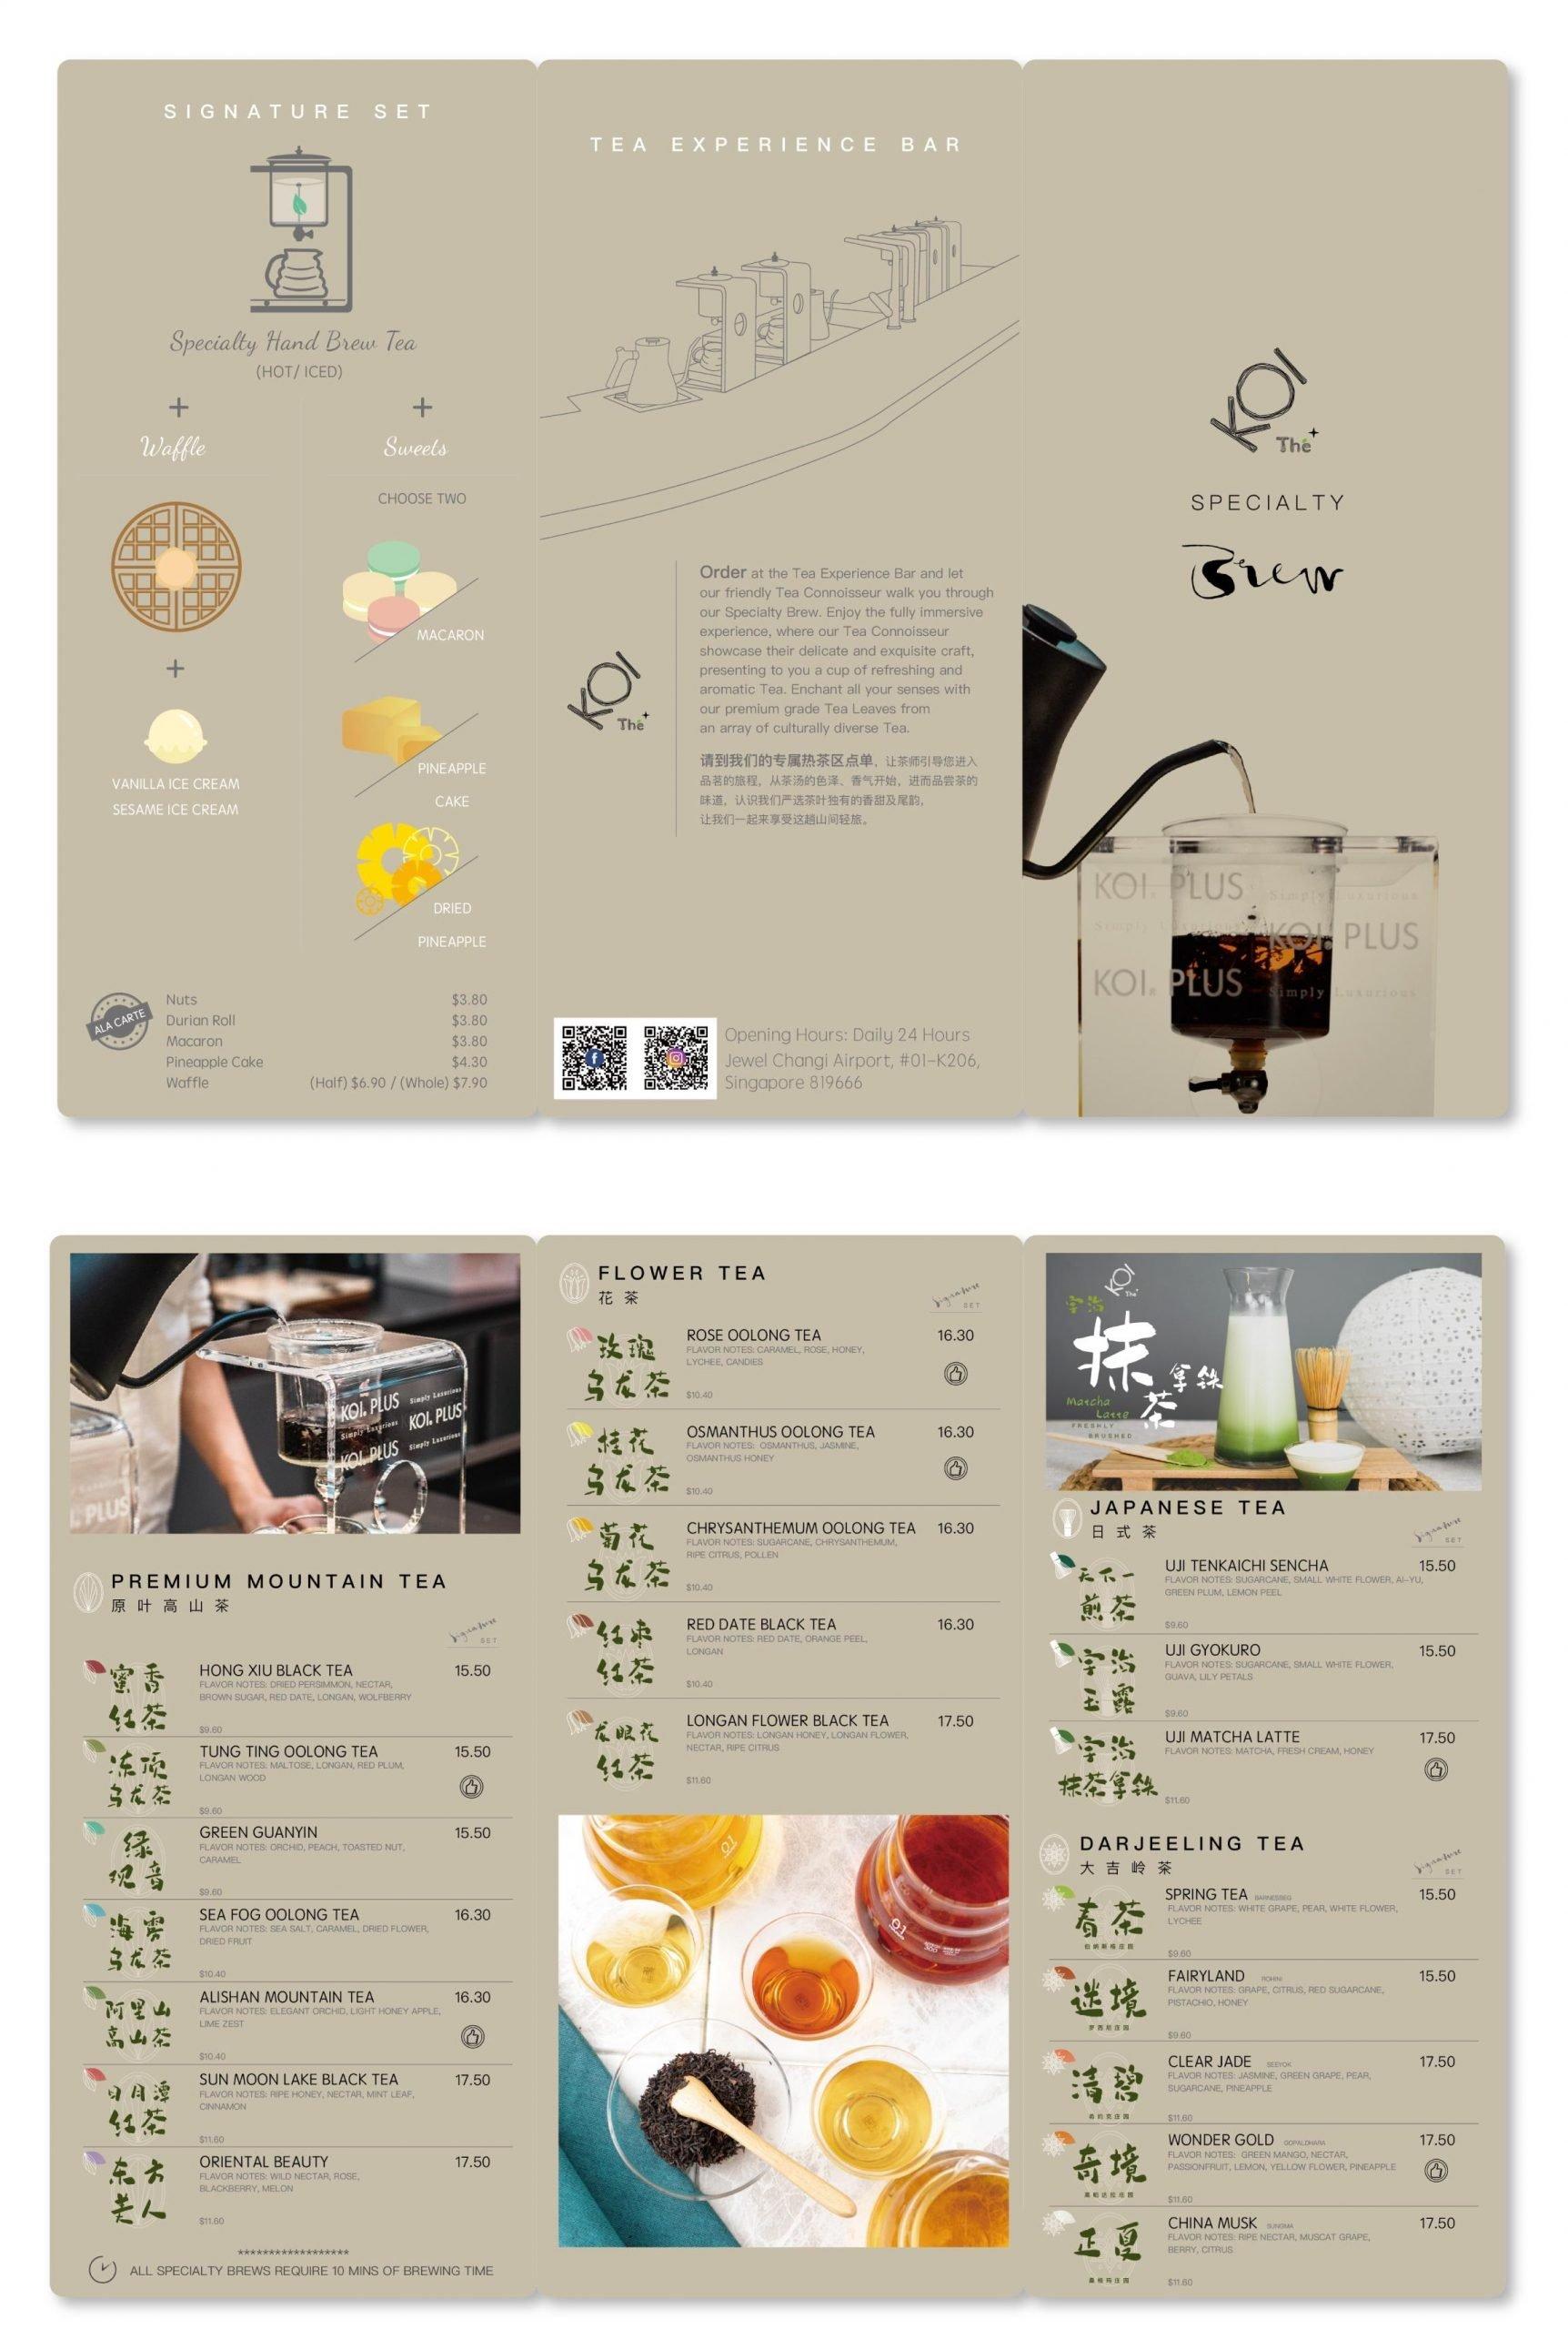 koi signature menu singapore